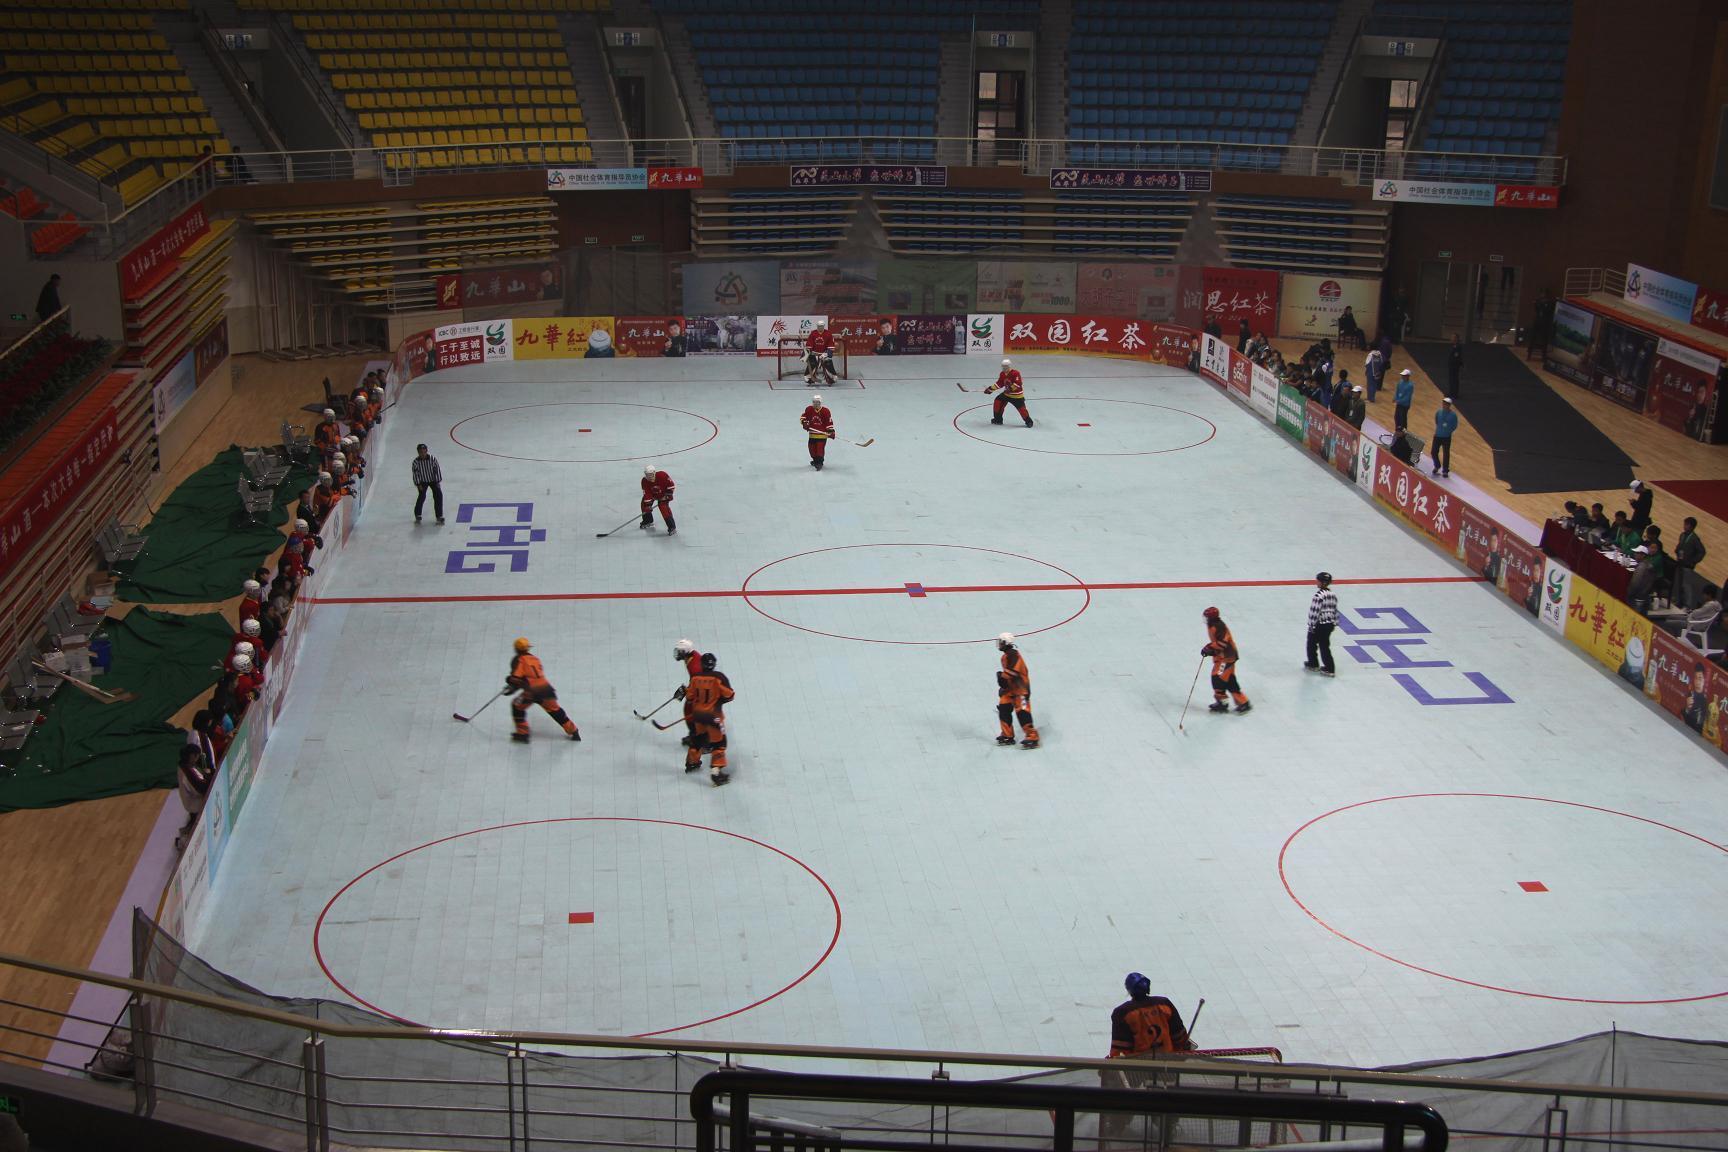 China No Holes Sports Court Floor Futsal Hockey Court Floor Tile